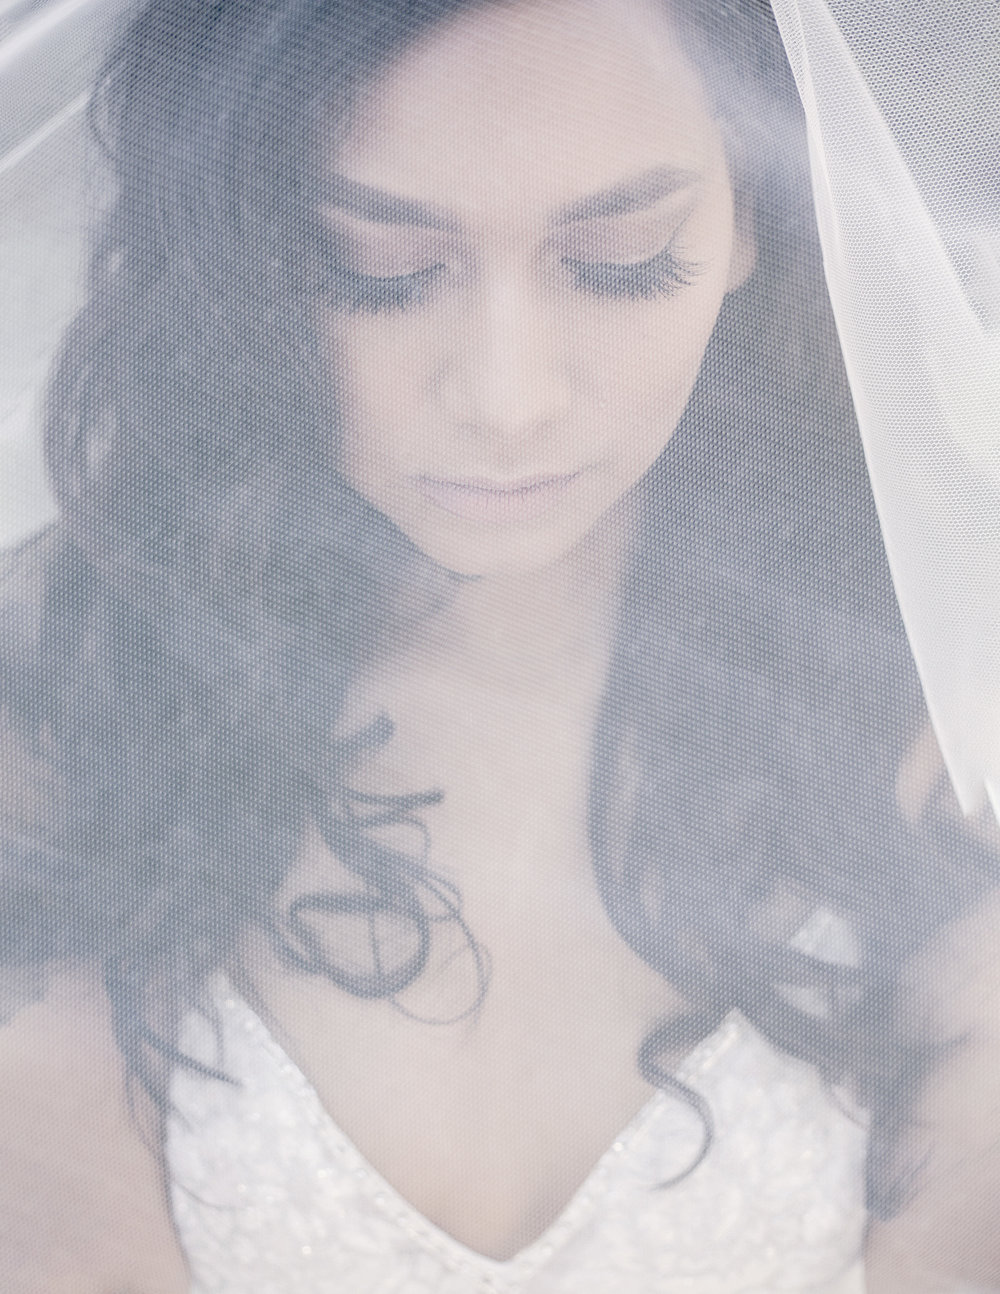 savannah-bridal-shop-unexpected-joys-of-wedding-planning-savannah-wedding-planning-gina-vogel-photography-savannah-weddings-6.jpg